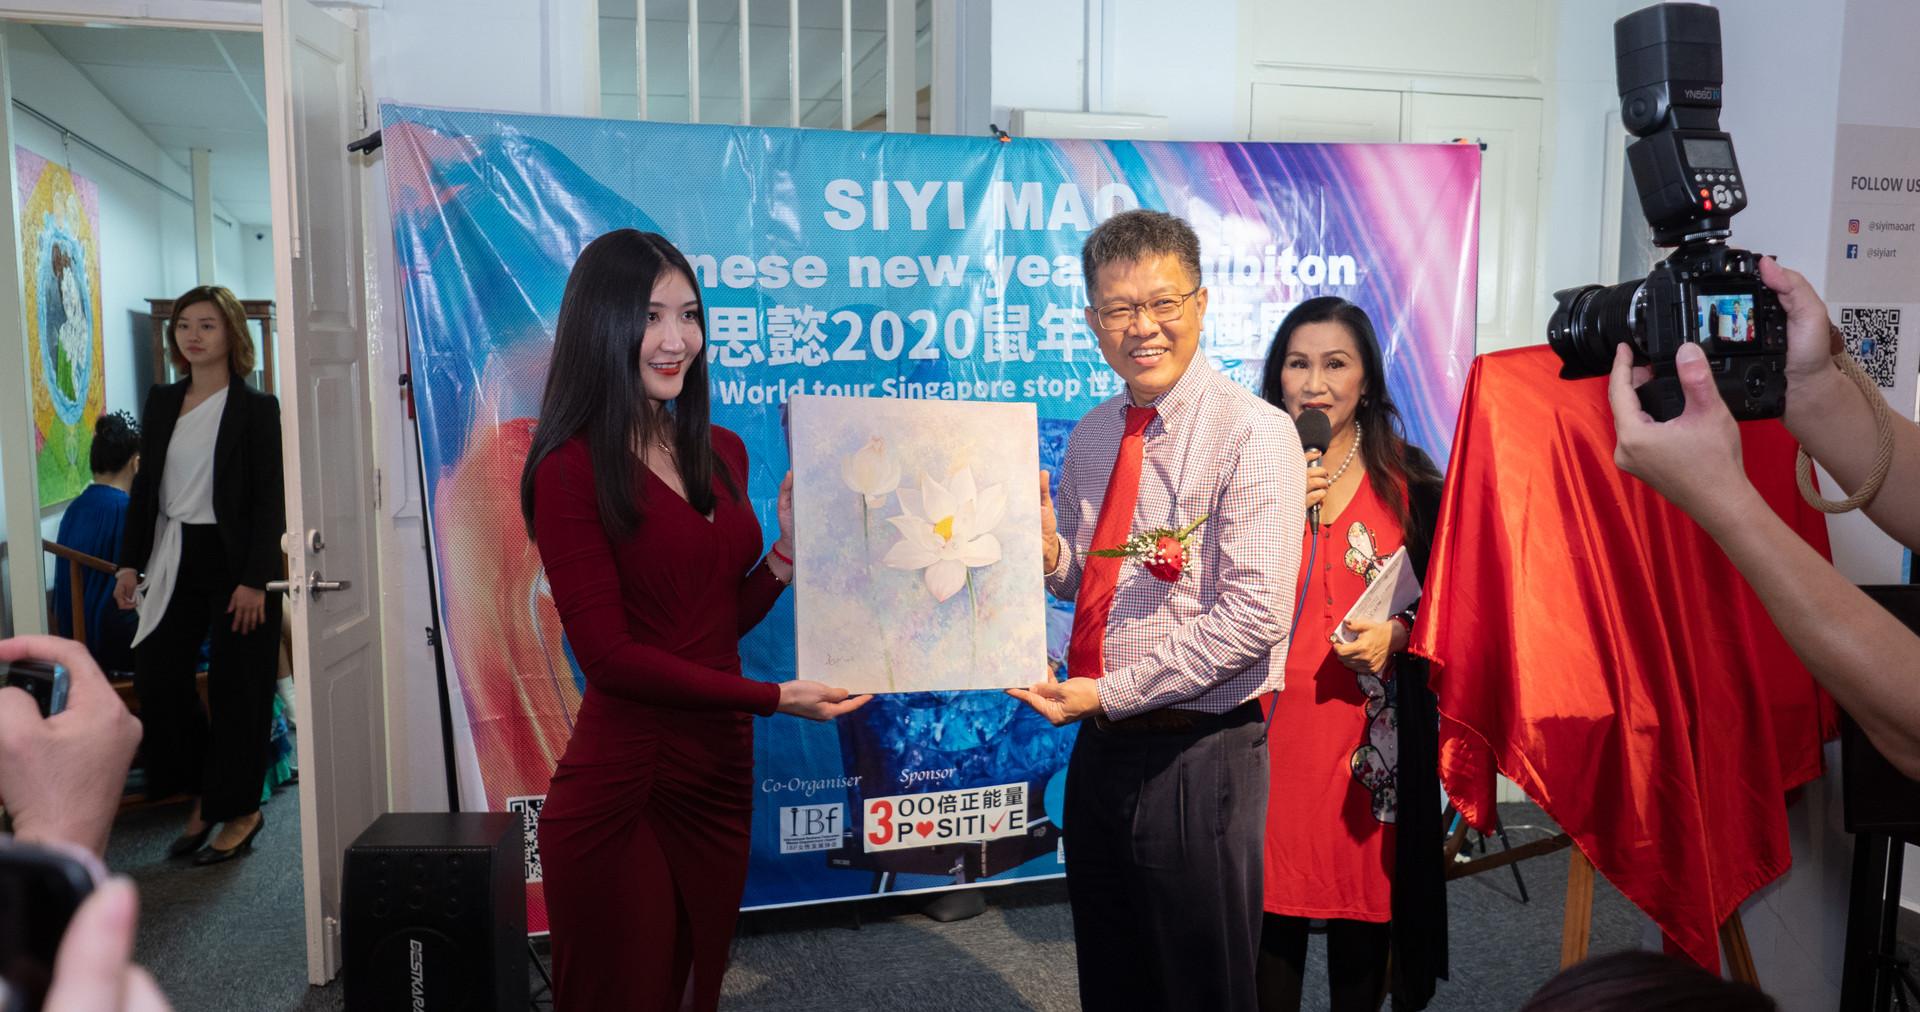 Mao Siyi Chinese New Year Art Exhibition